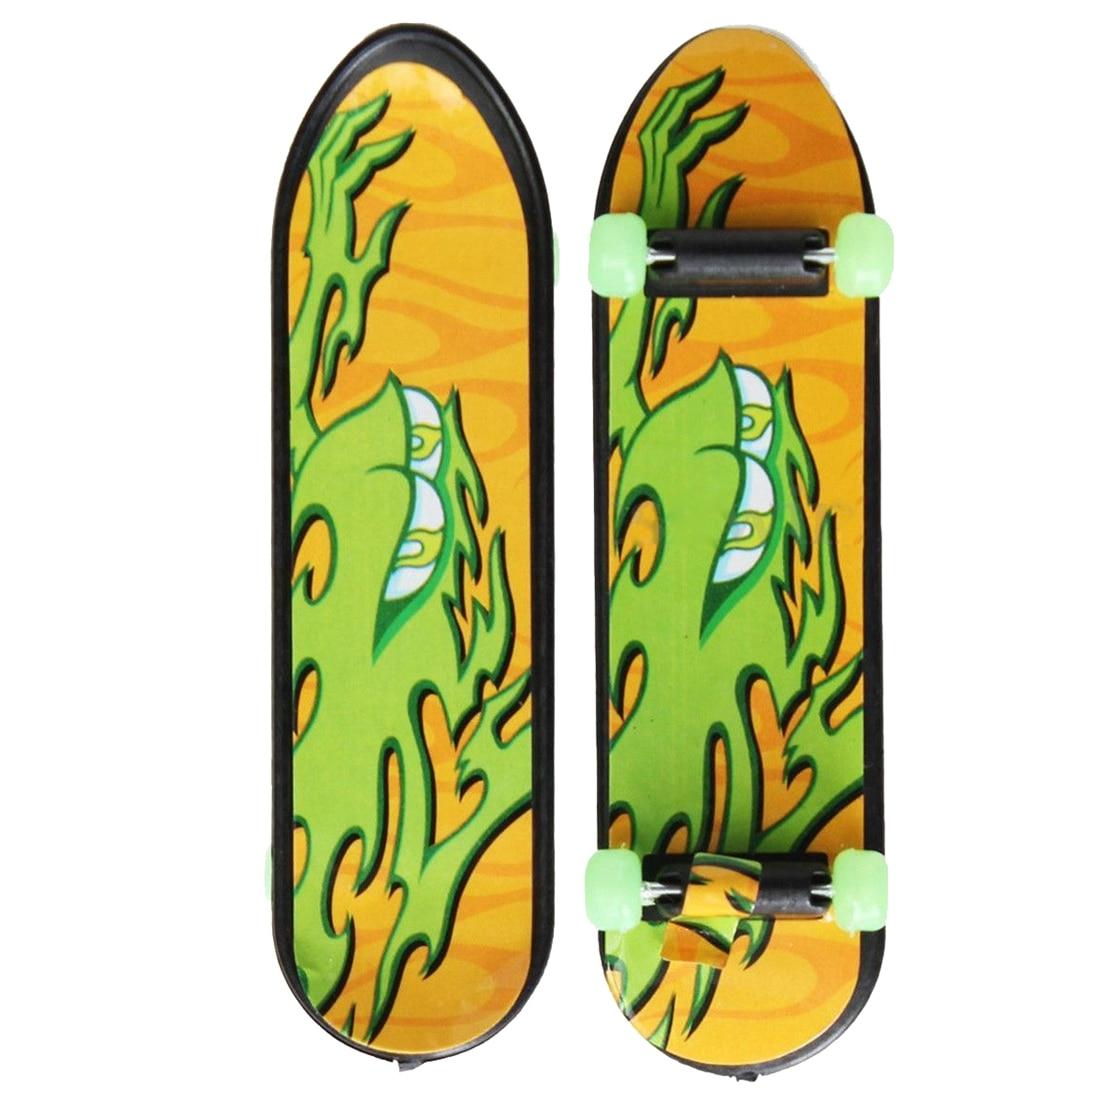 24pcs/Pack Fingerboards Finger Board Deck Skateboard 3.94inch Mini Kids Games Toys